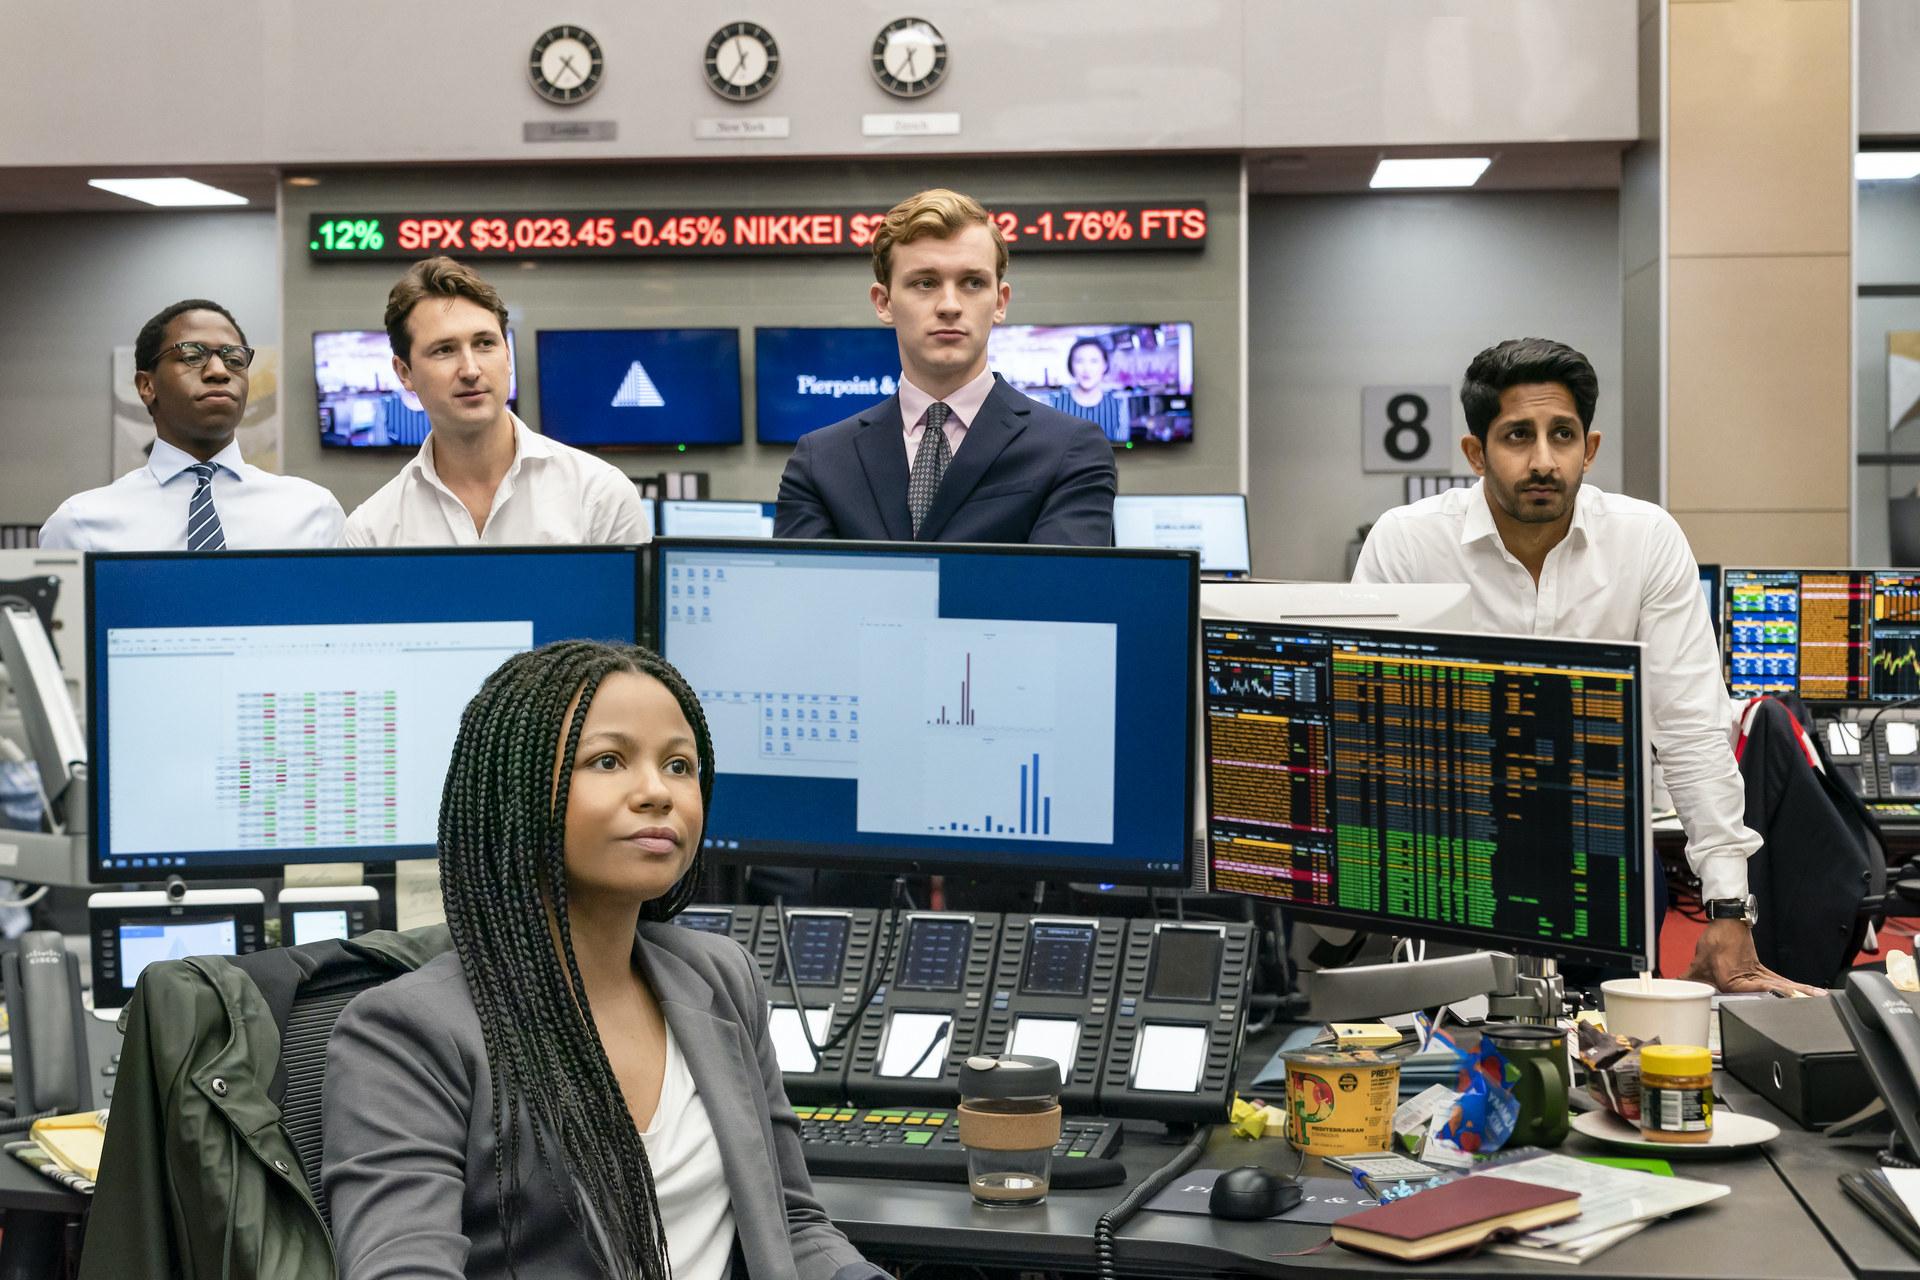 David Jonsson, Ben Lloyd-Hughes, Harry Lawtey, Sagar Radia, and Myha'la Herrold huddle together in their investing office